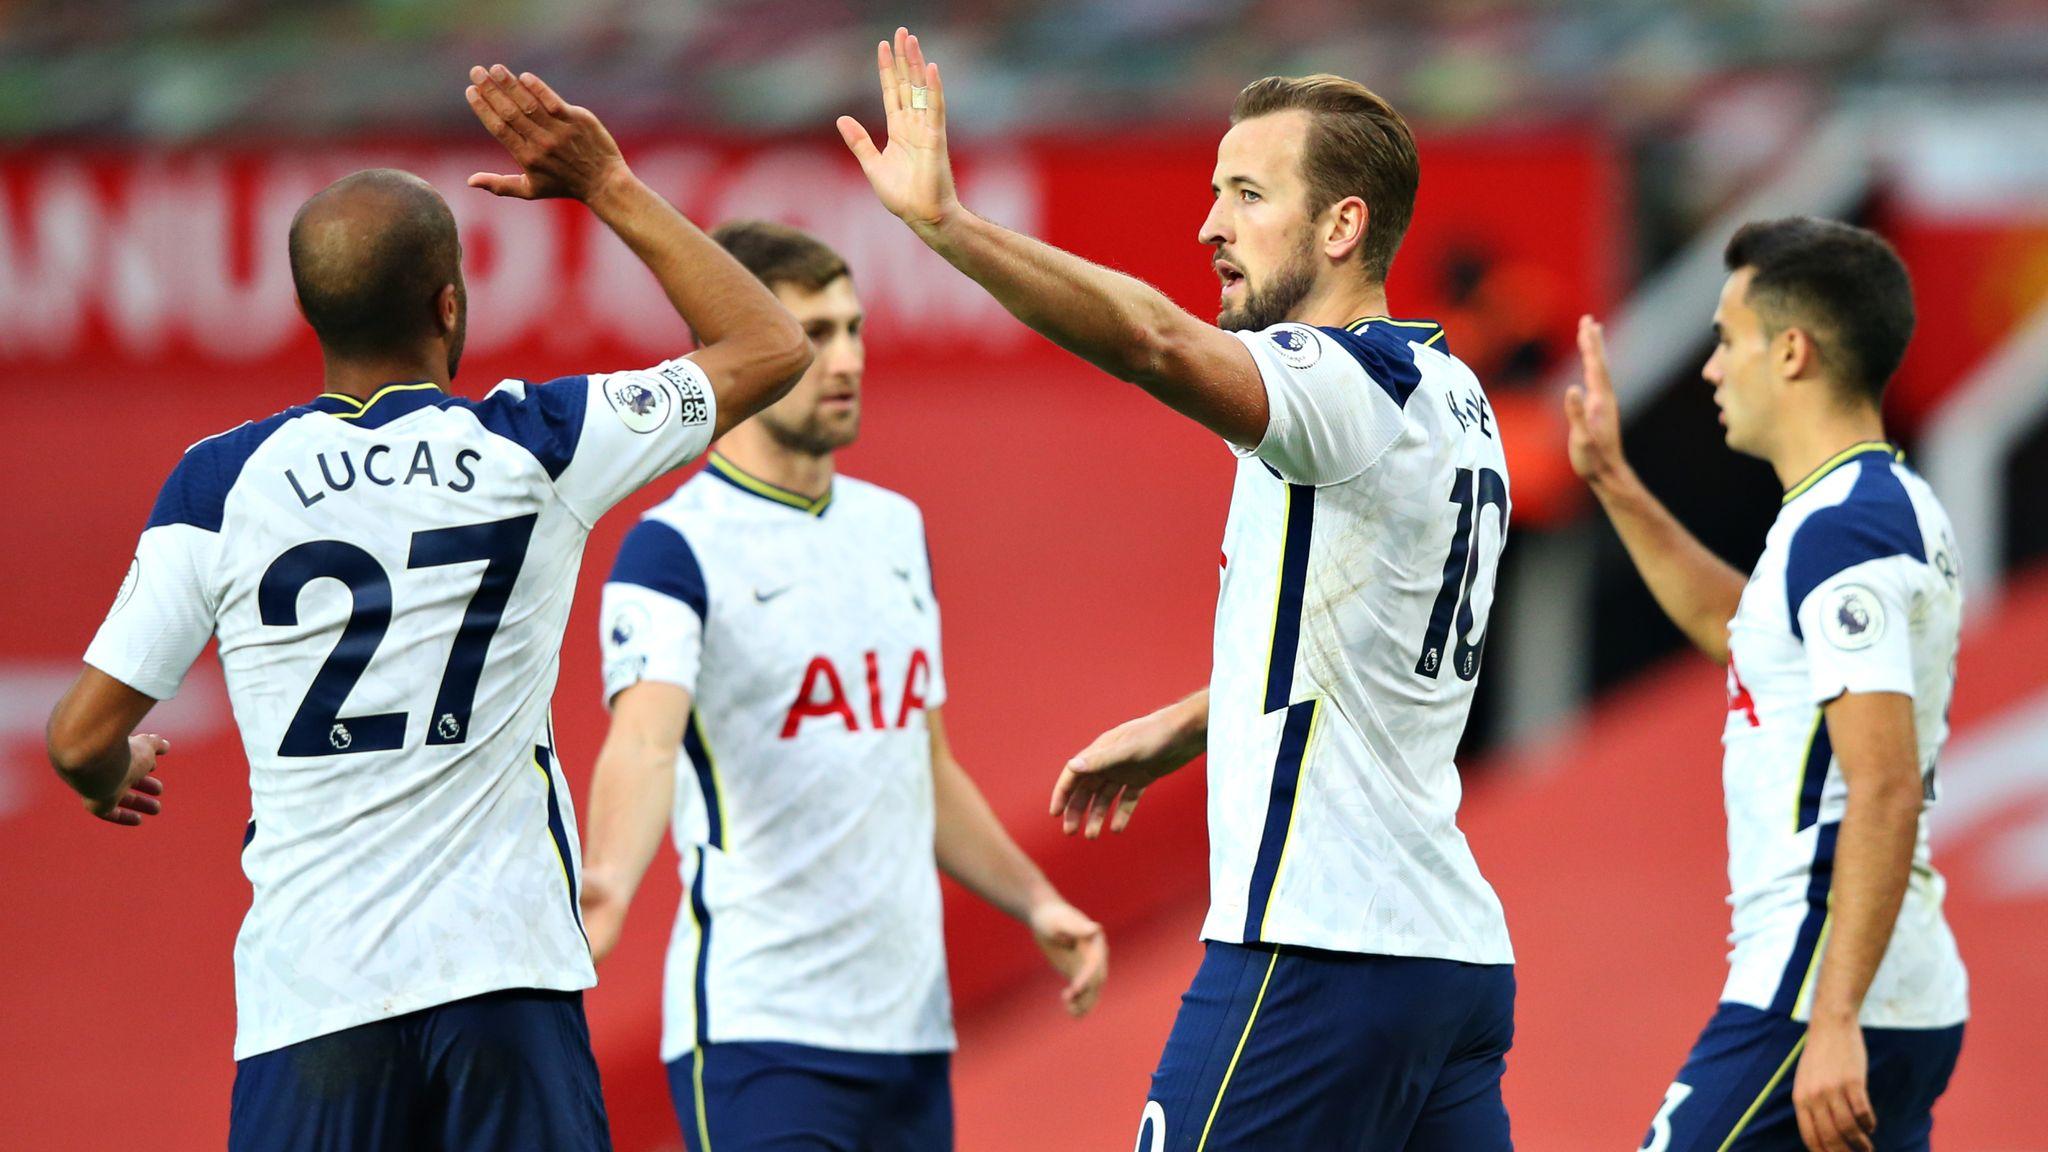 Man Utd 1 - 6 Tottenham - Match Report & Highlights